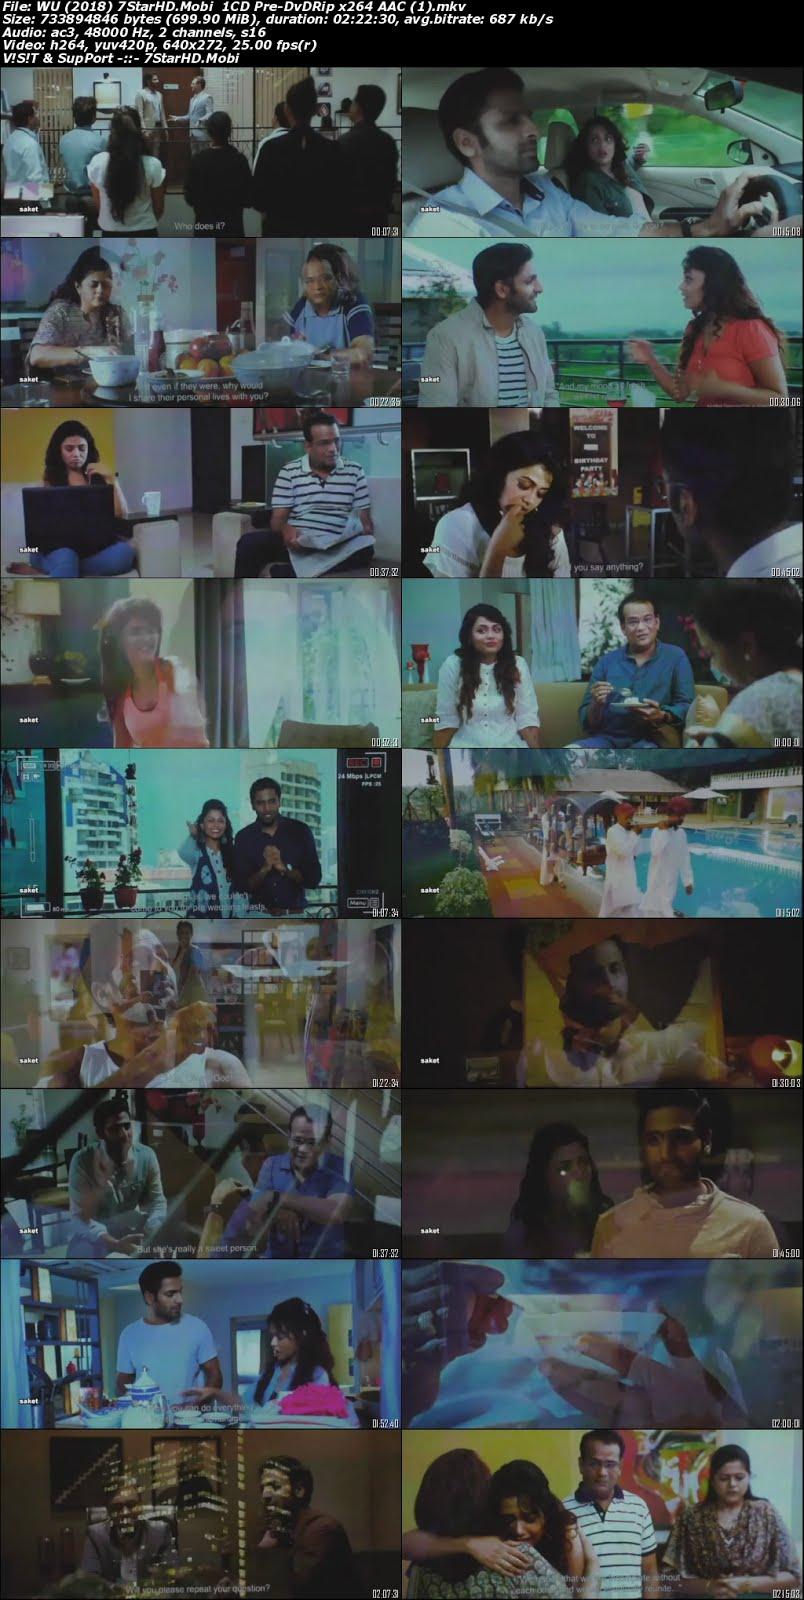 Whats up lagna (2018) Marathi 1CD Pre-DVDRip x264 700MB 2